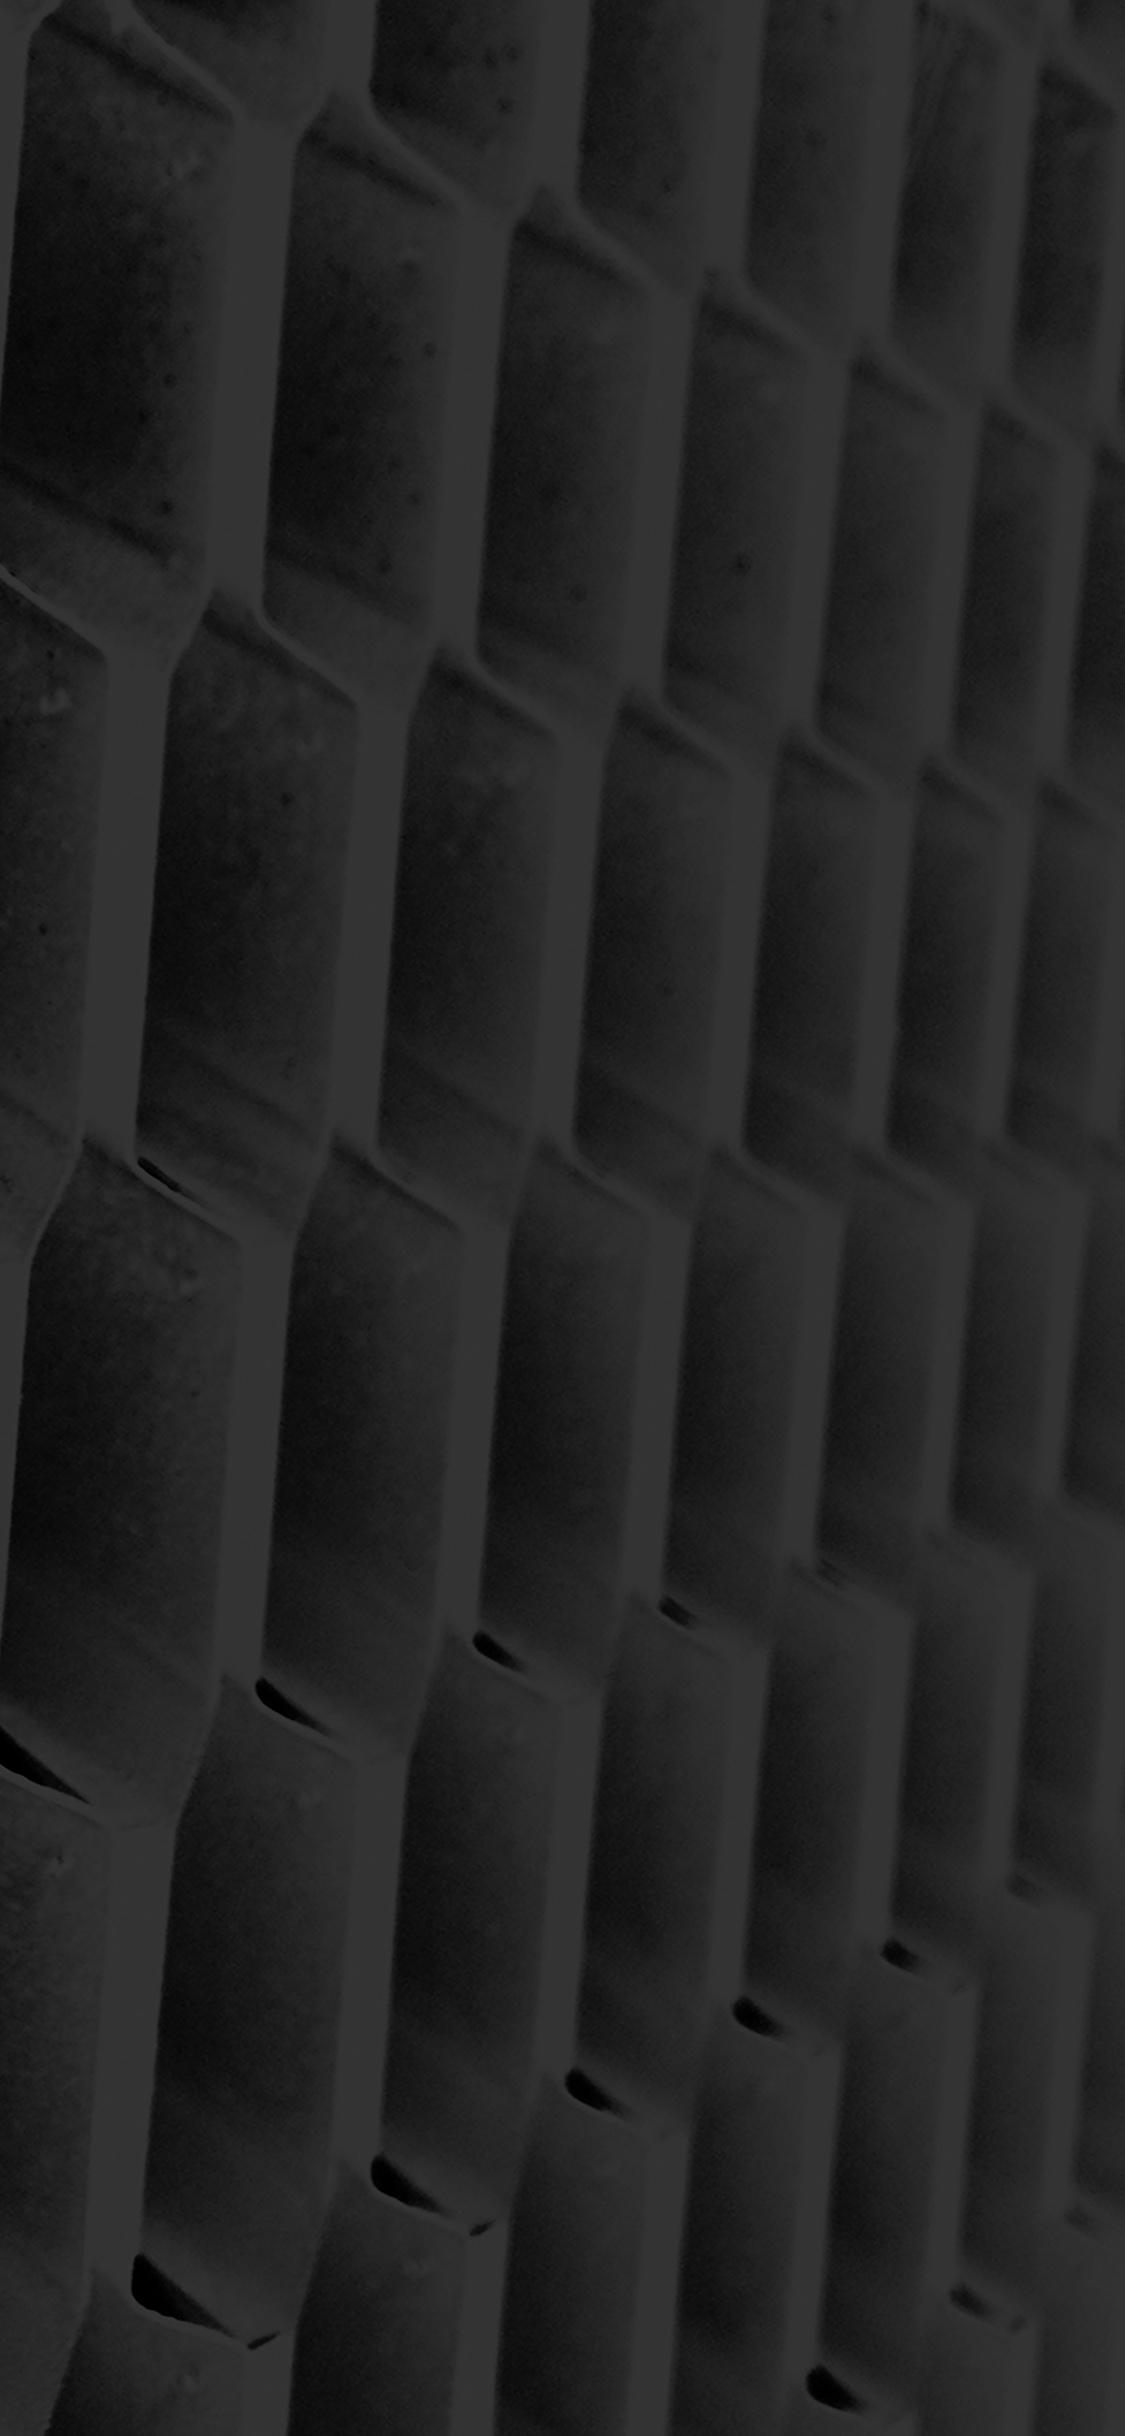 iPhoneXpapers.com-Apple-iPhone-wallpaper-vi93-honeycomb-metal-dark-bw-pattern